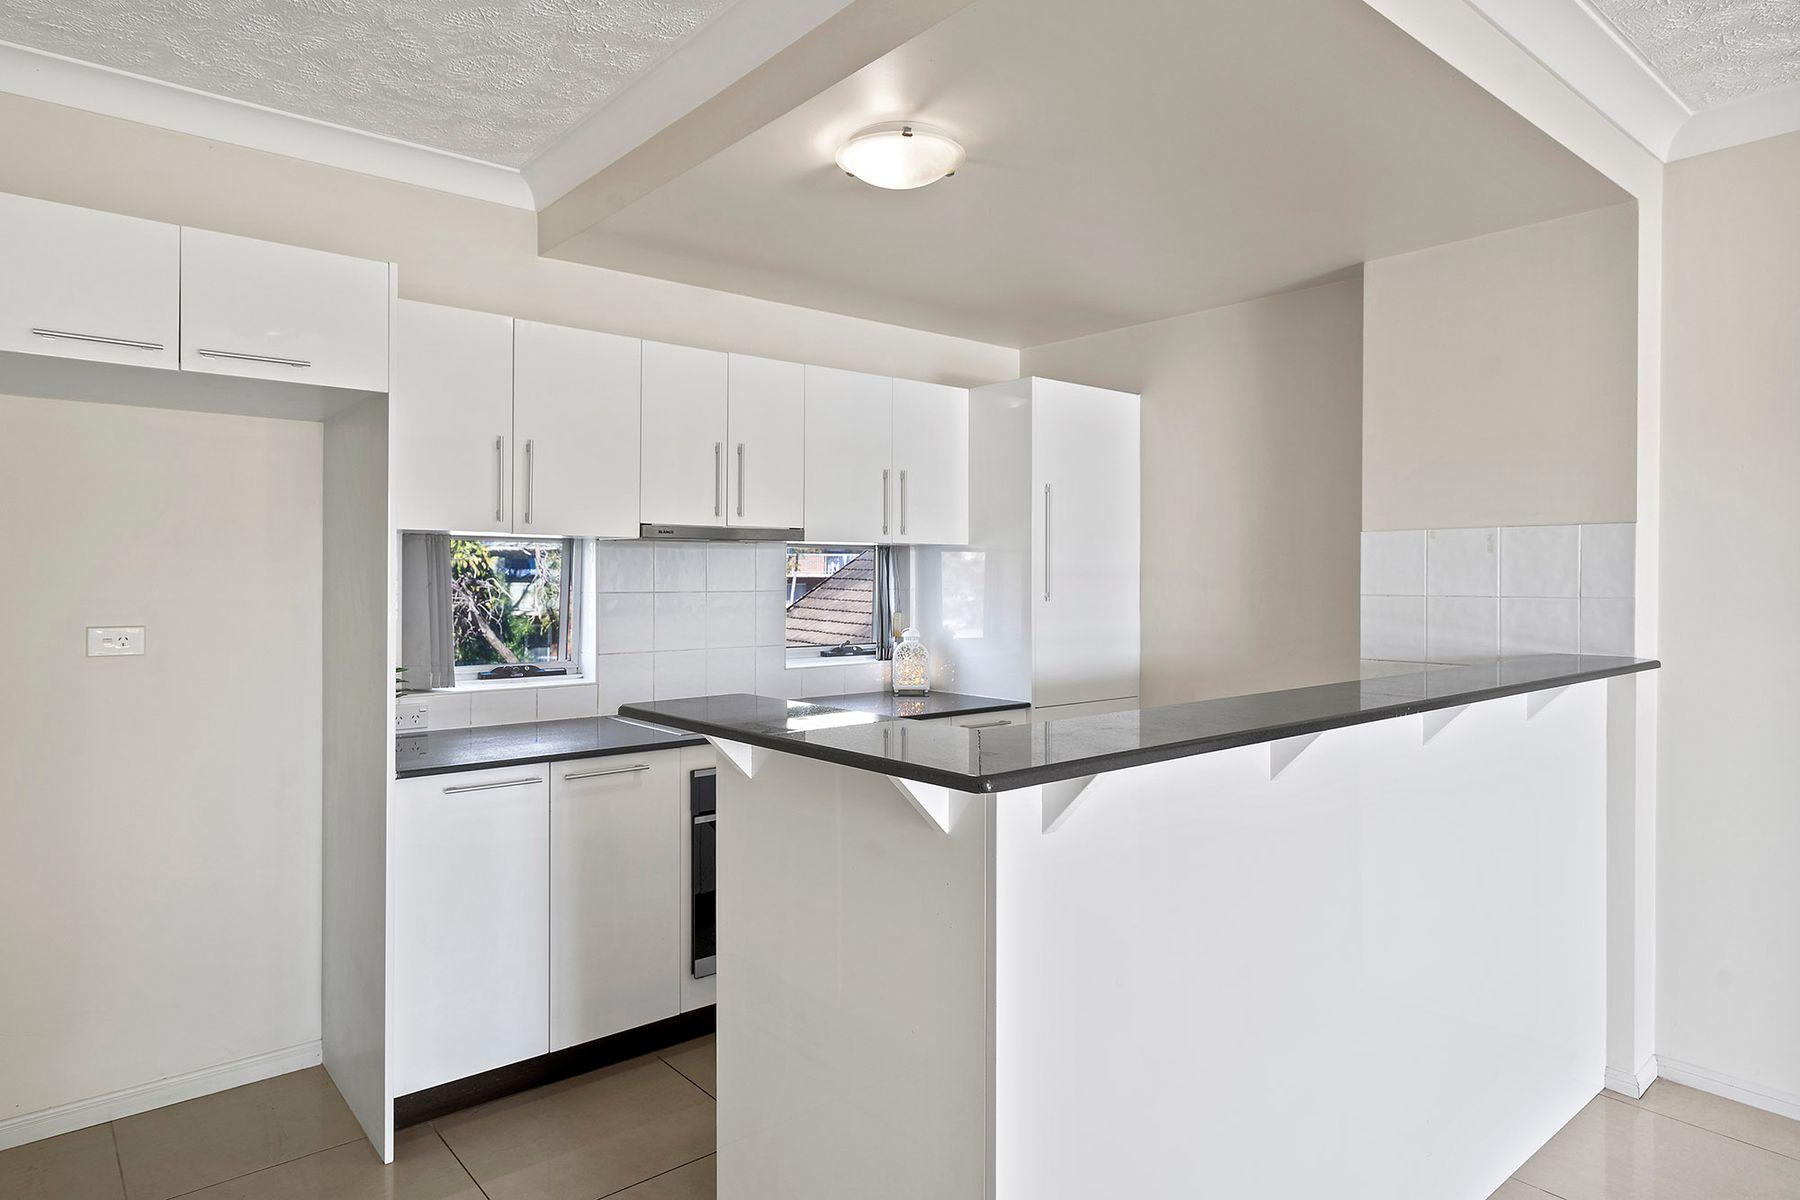 7/84 Tenby Street, Mount Gravatt, QLD 4122